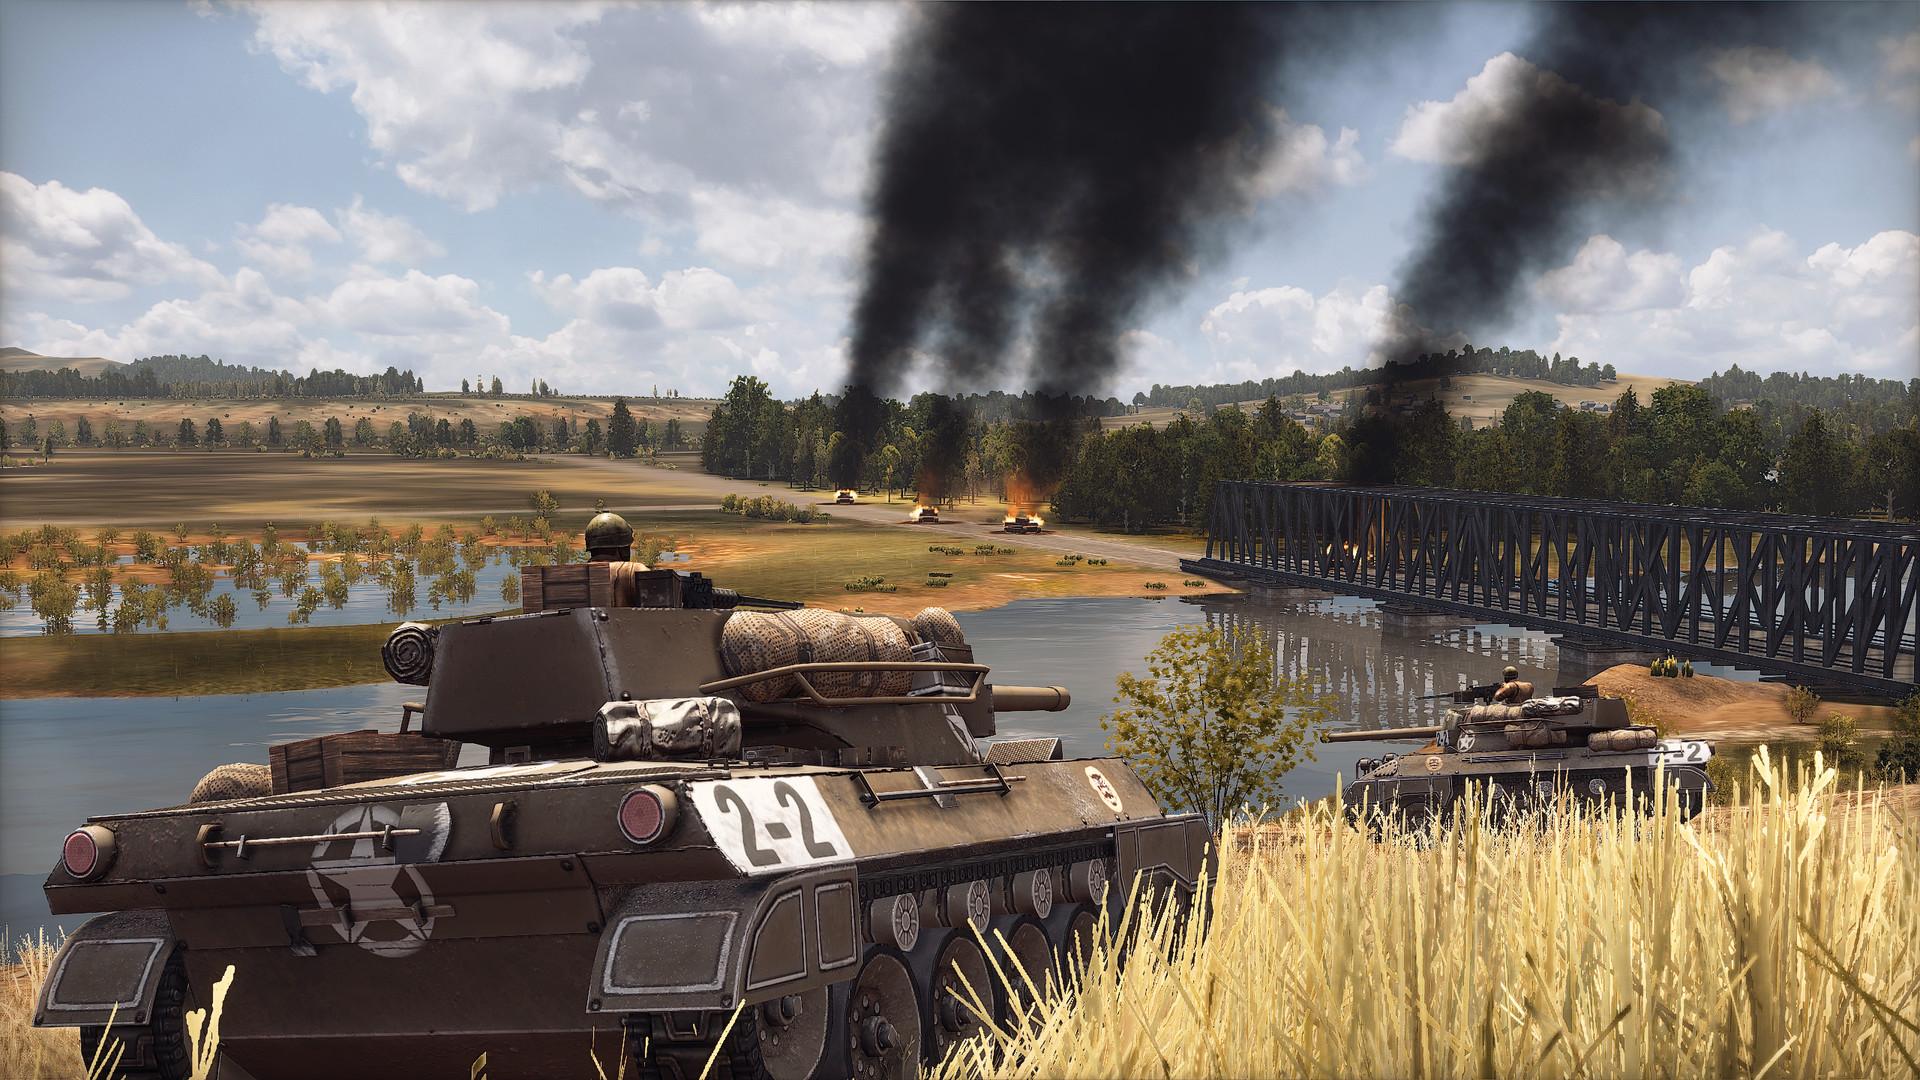 steel-division-2-pc-screenshot-04